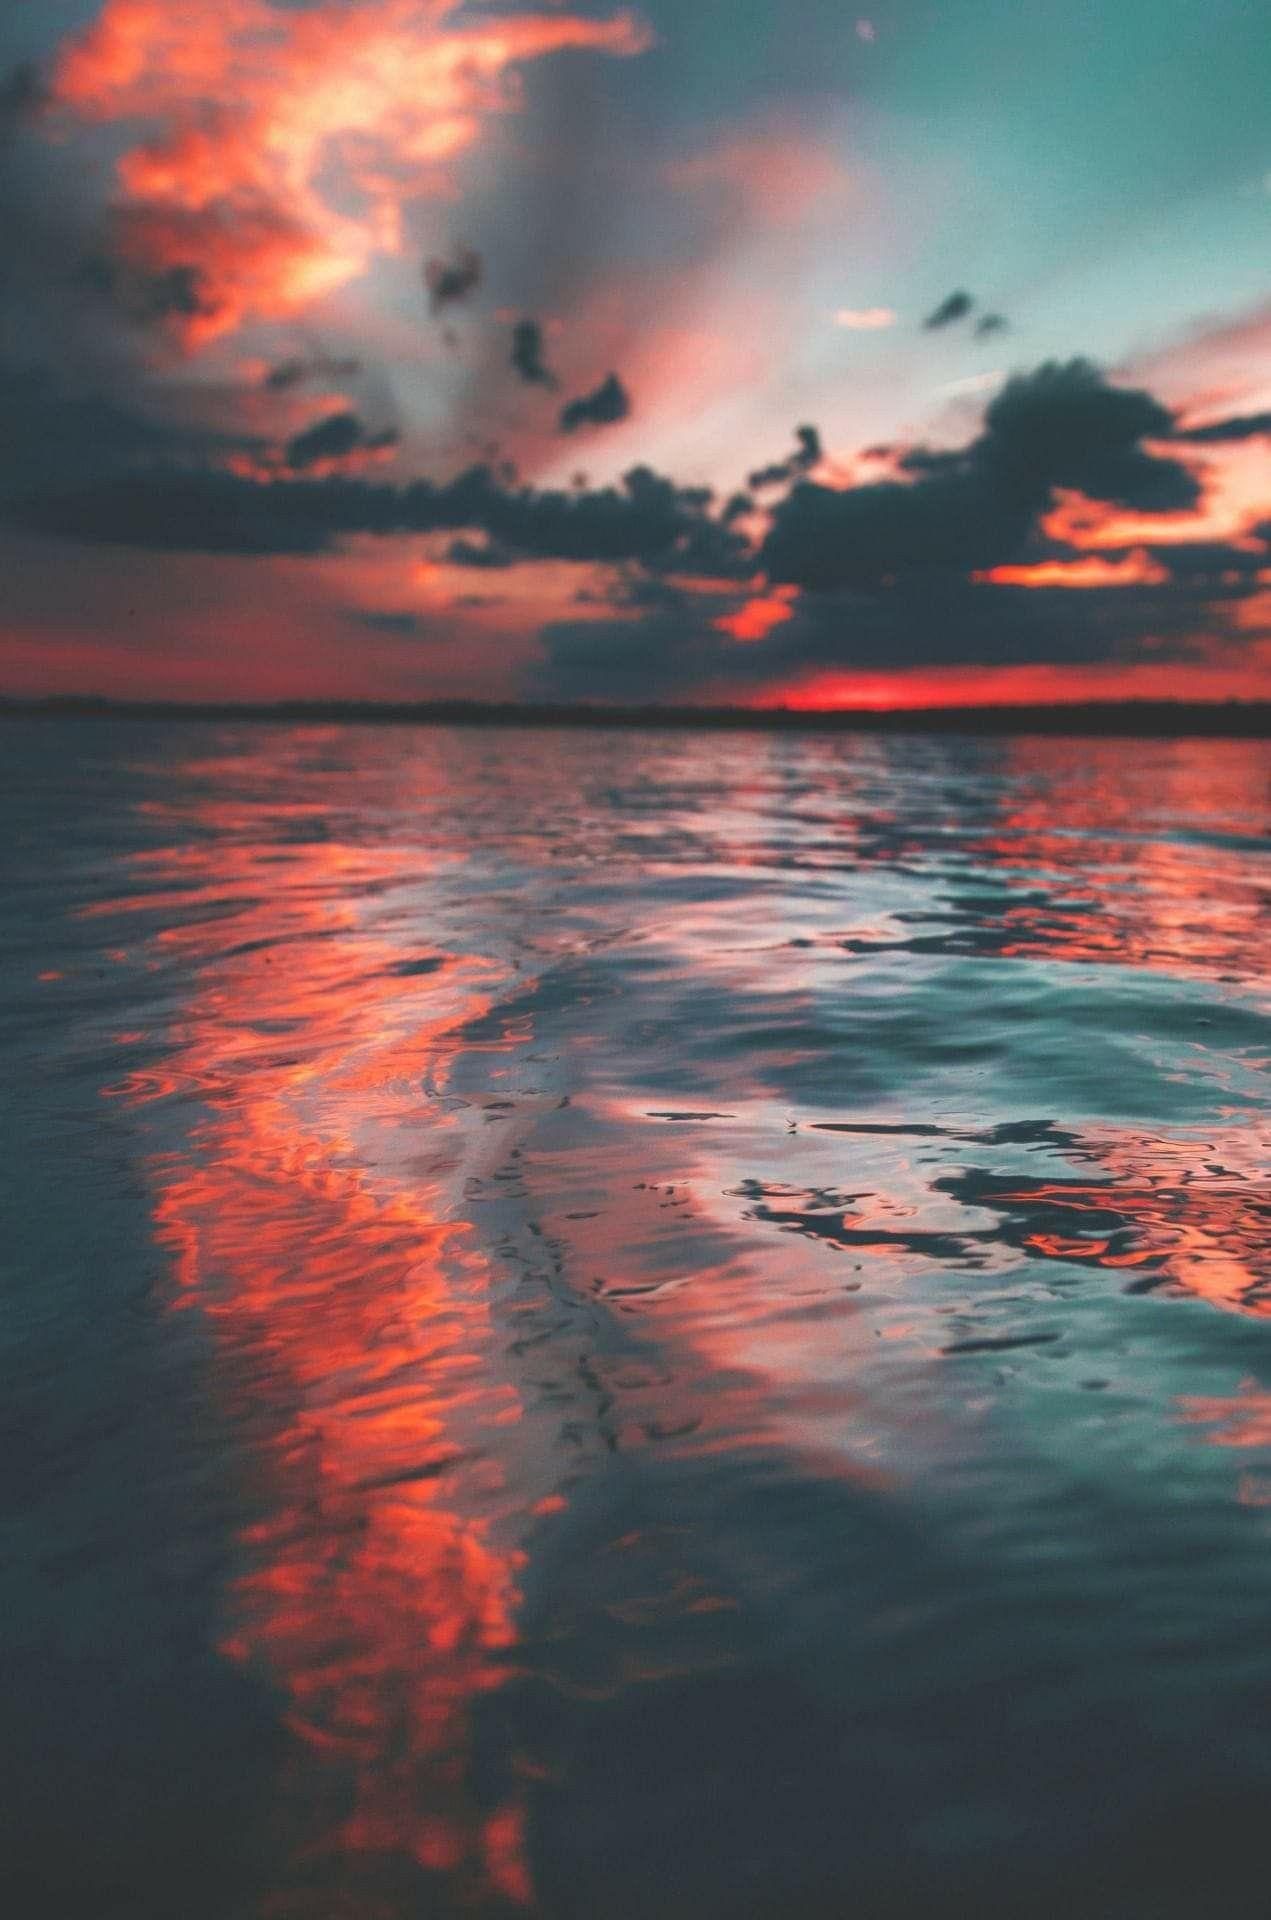 Sunrise To Sunset image by Barbara Calhoun | Nature ...